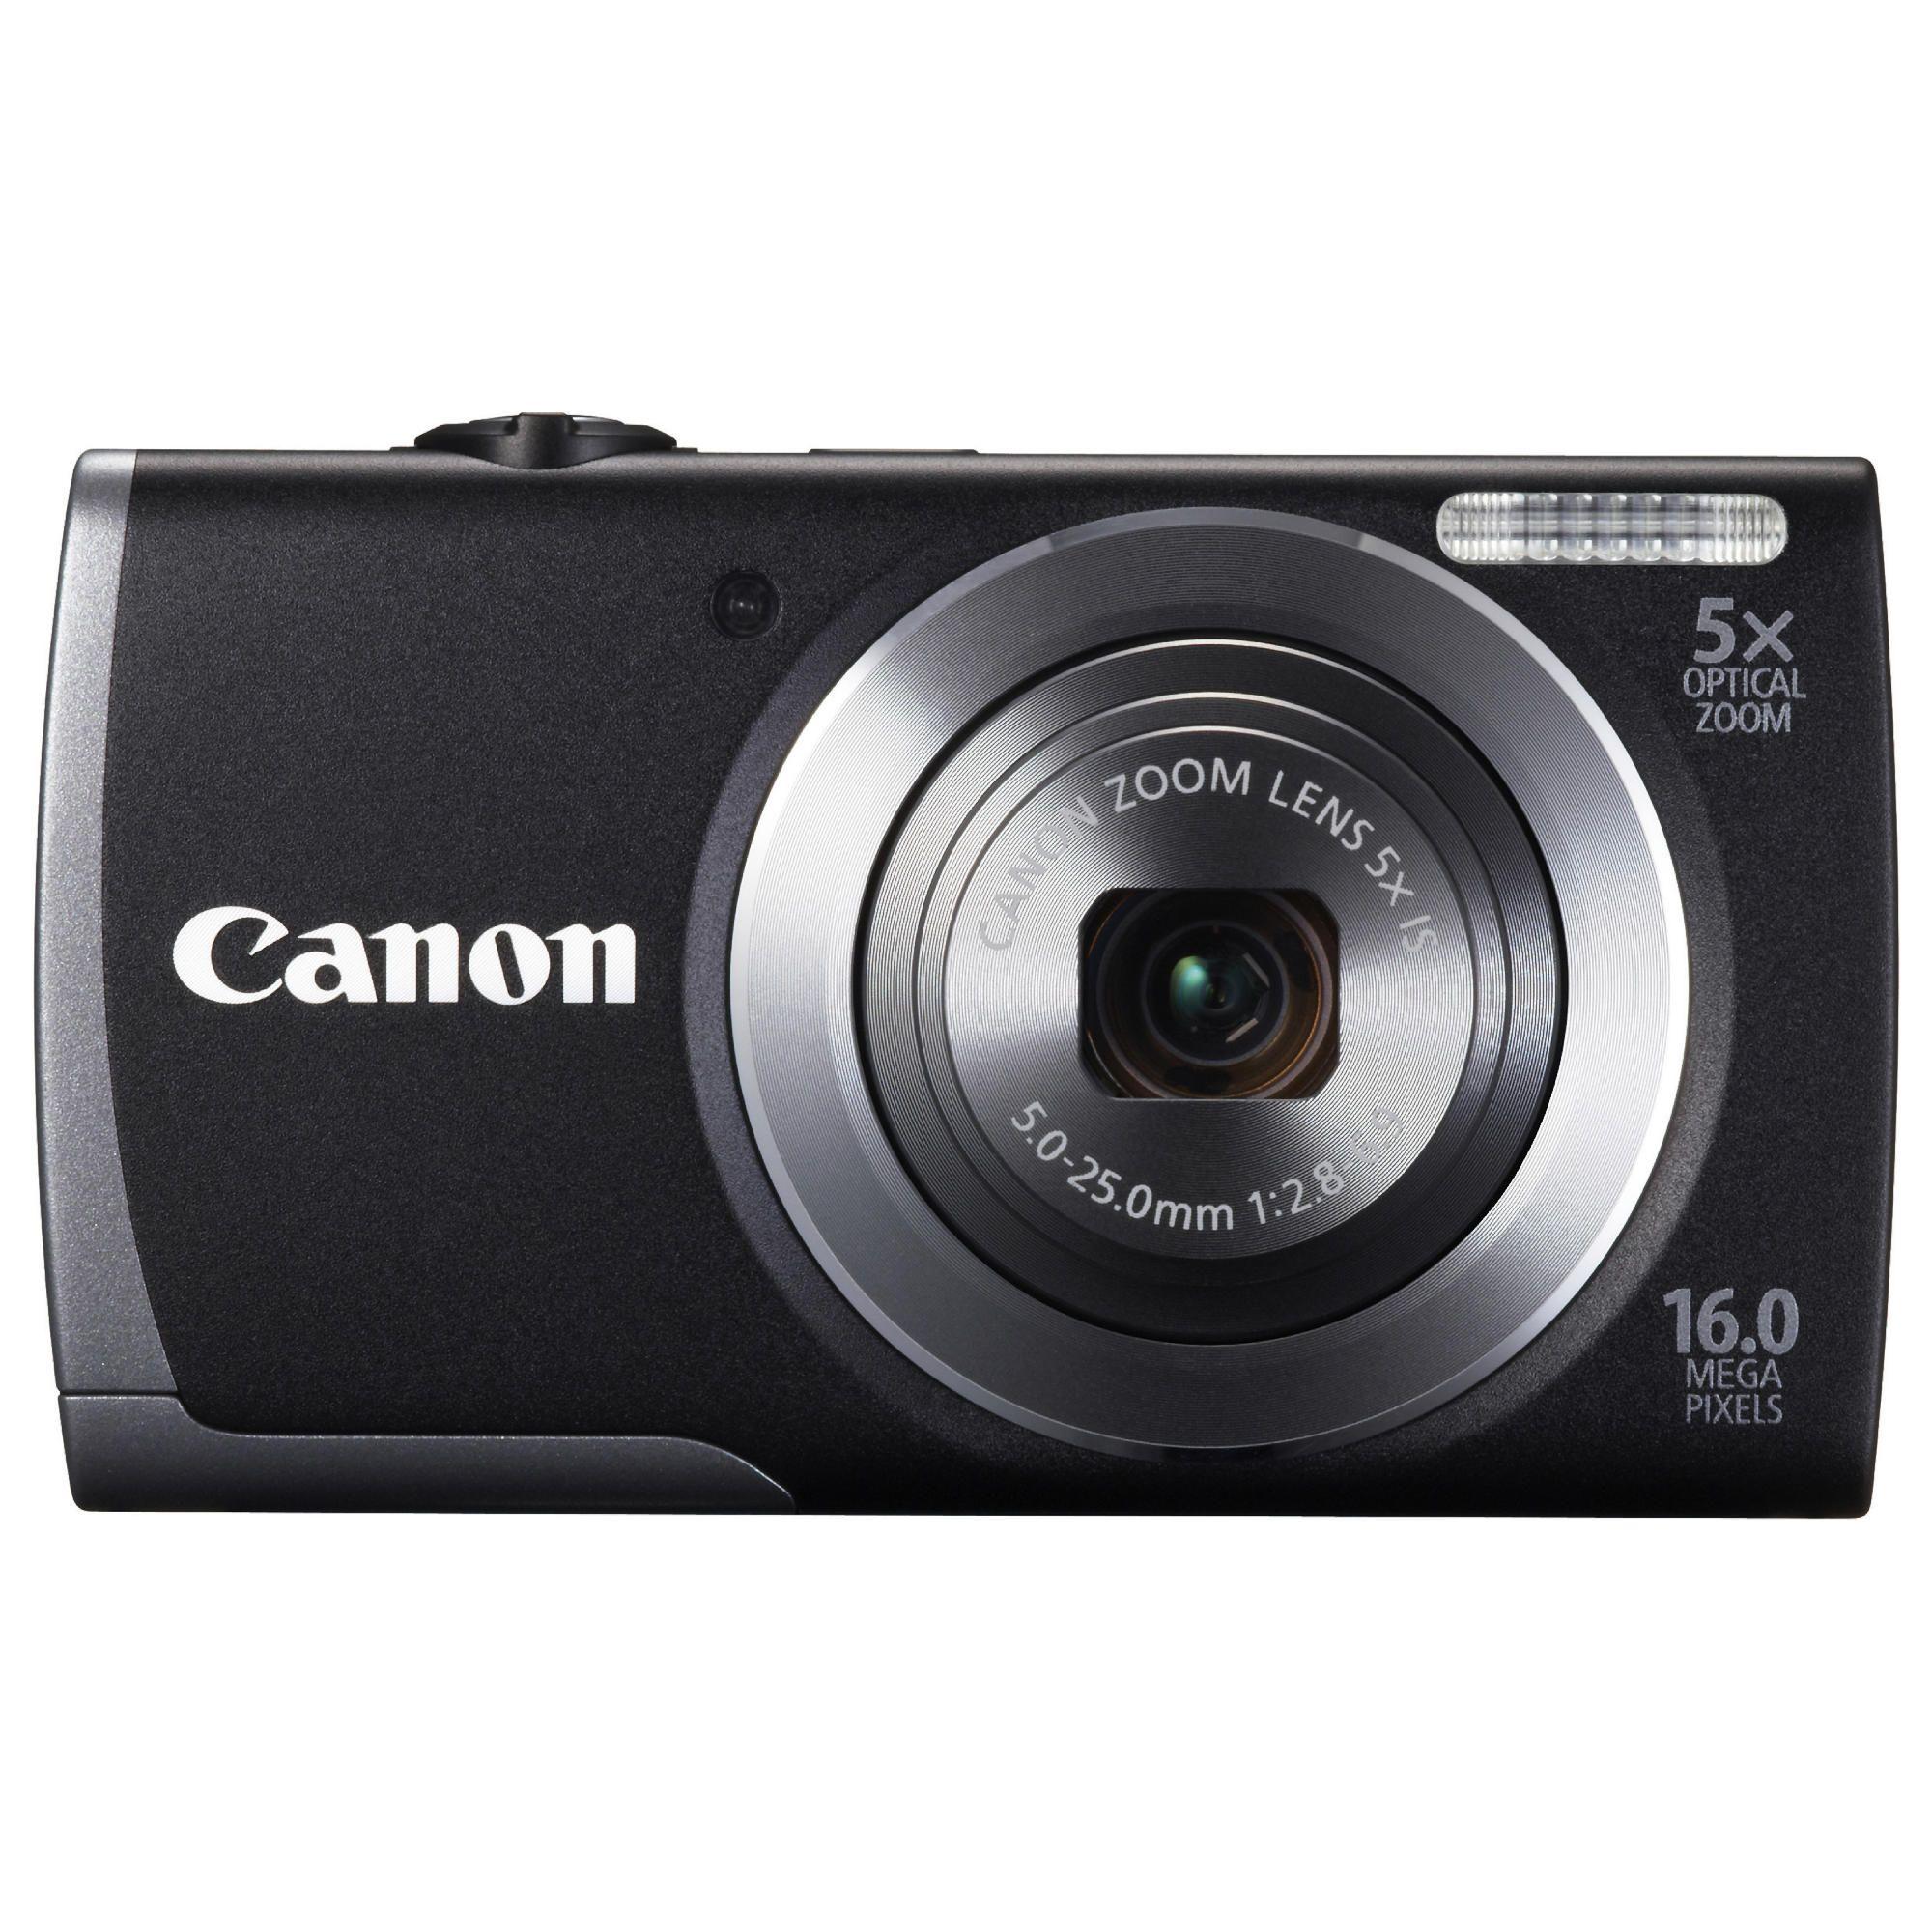 Canon A3500 Digital Camera, Black, 16MP, 5x Optical Zoom, 2.7 inch LCD Screen